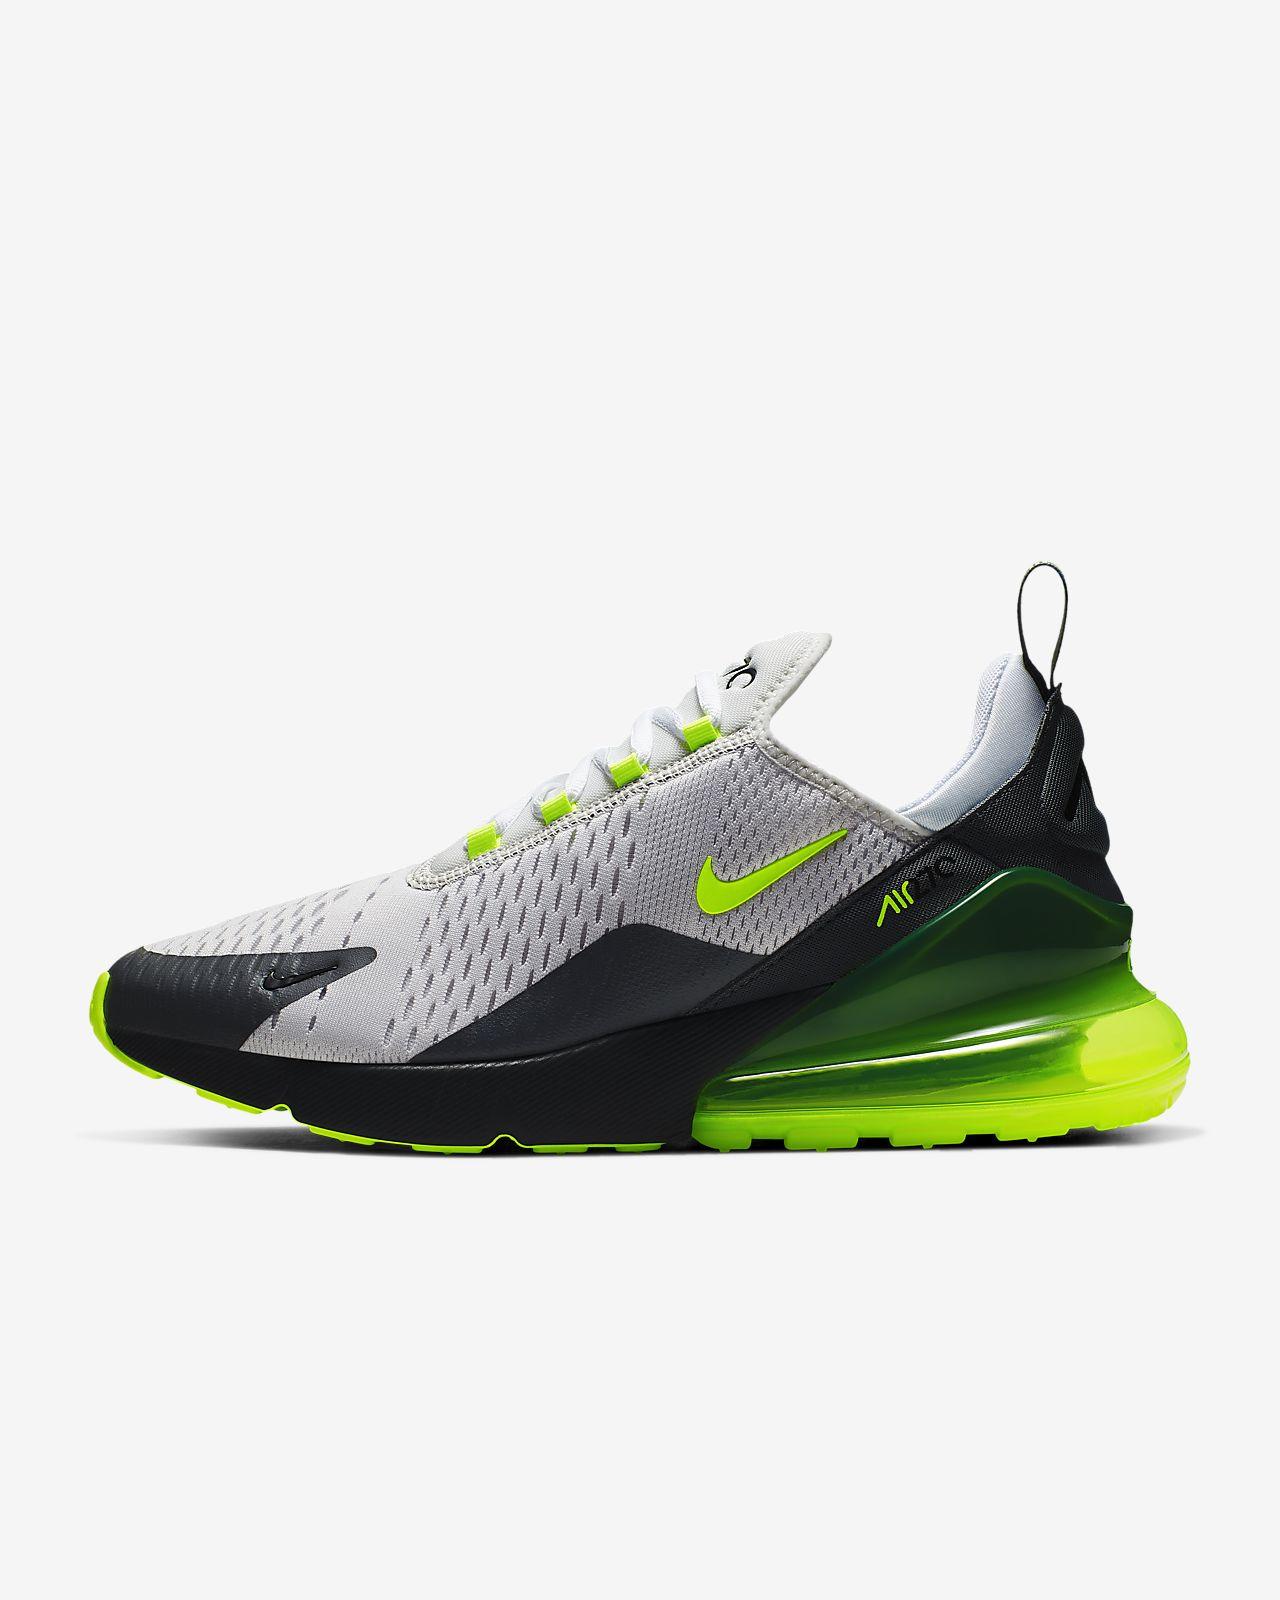 the best attitude d2125 44362 Nike Air Max 270 Men's Shoe